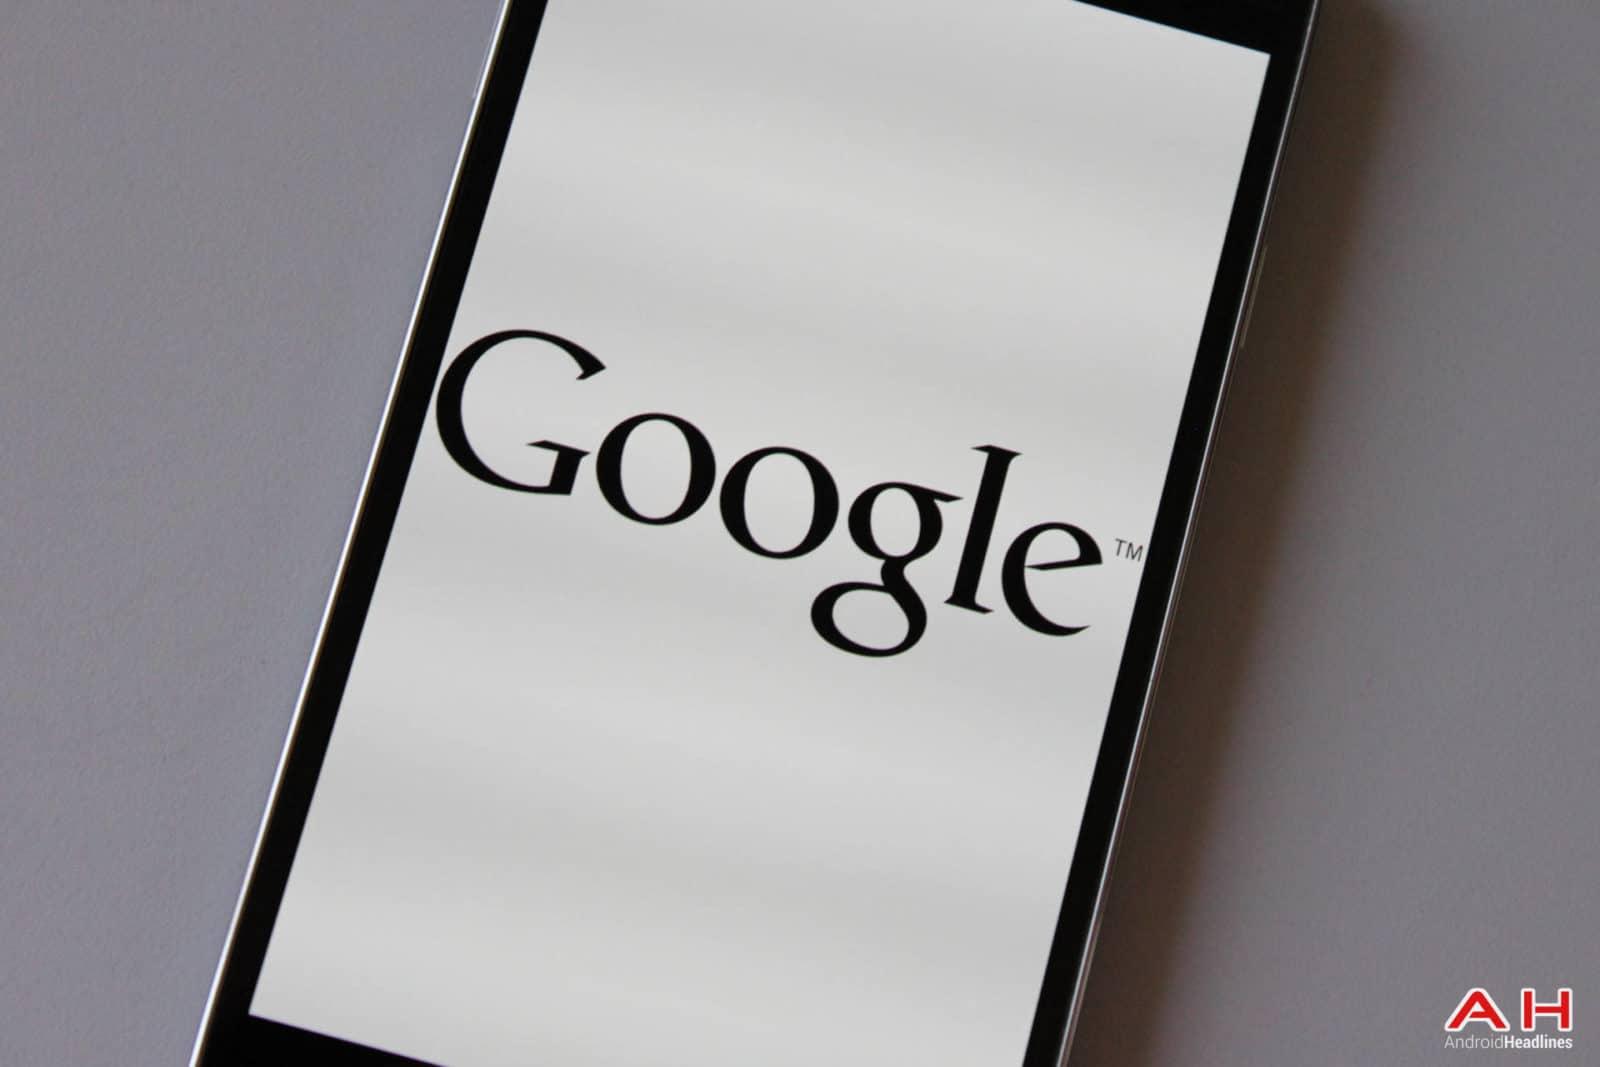 AH Google Logo White 1.0